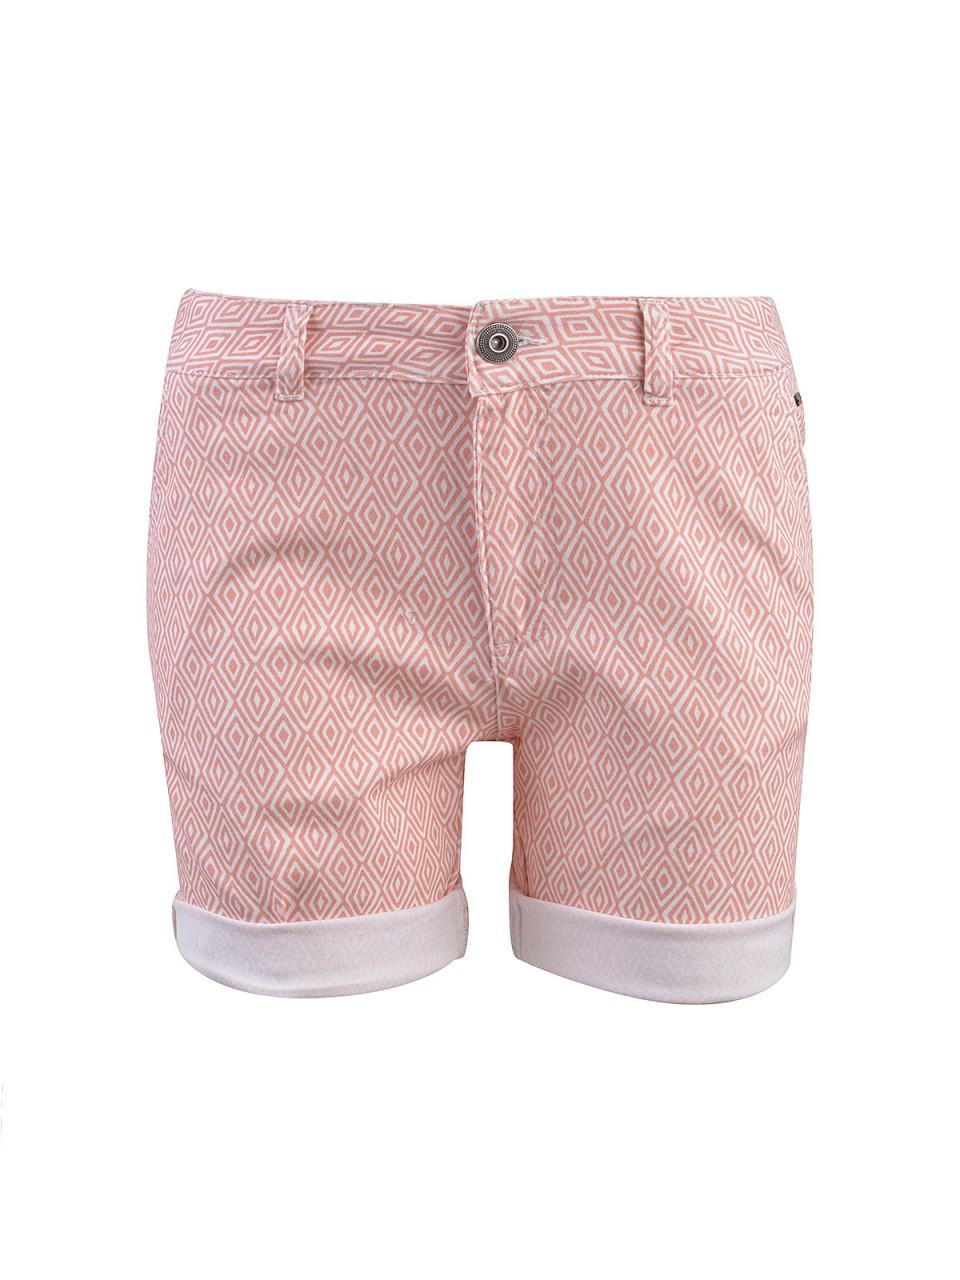 Hosen - SMITH SOUL Damen Shorts, rosa  - Onlineshop Designermode.com